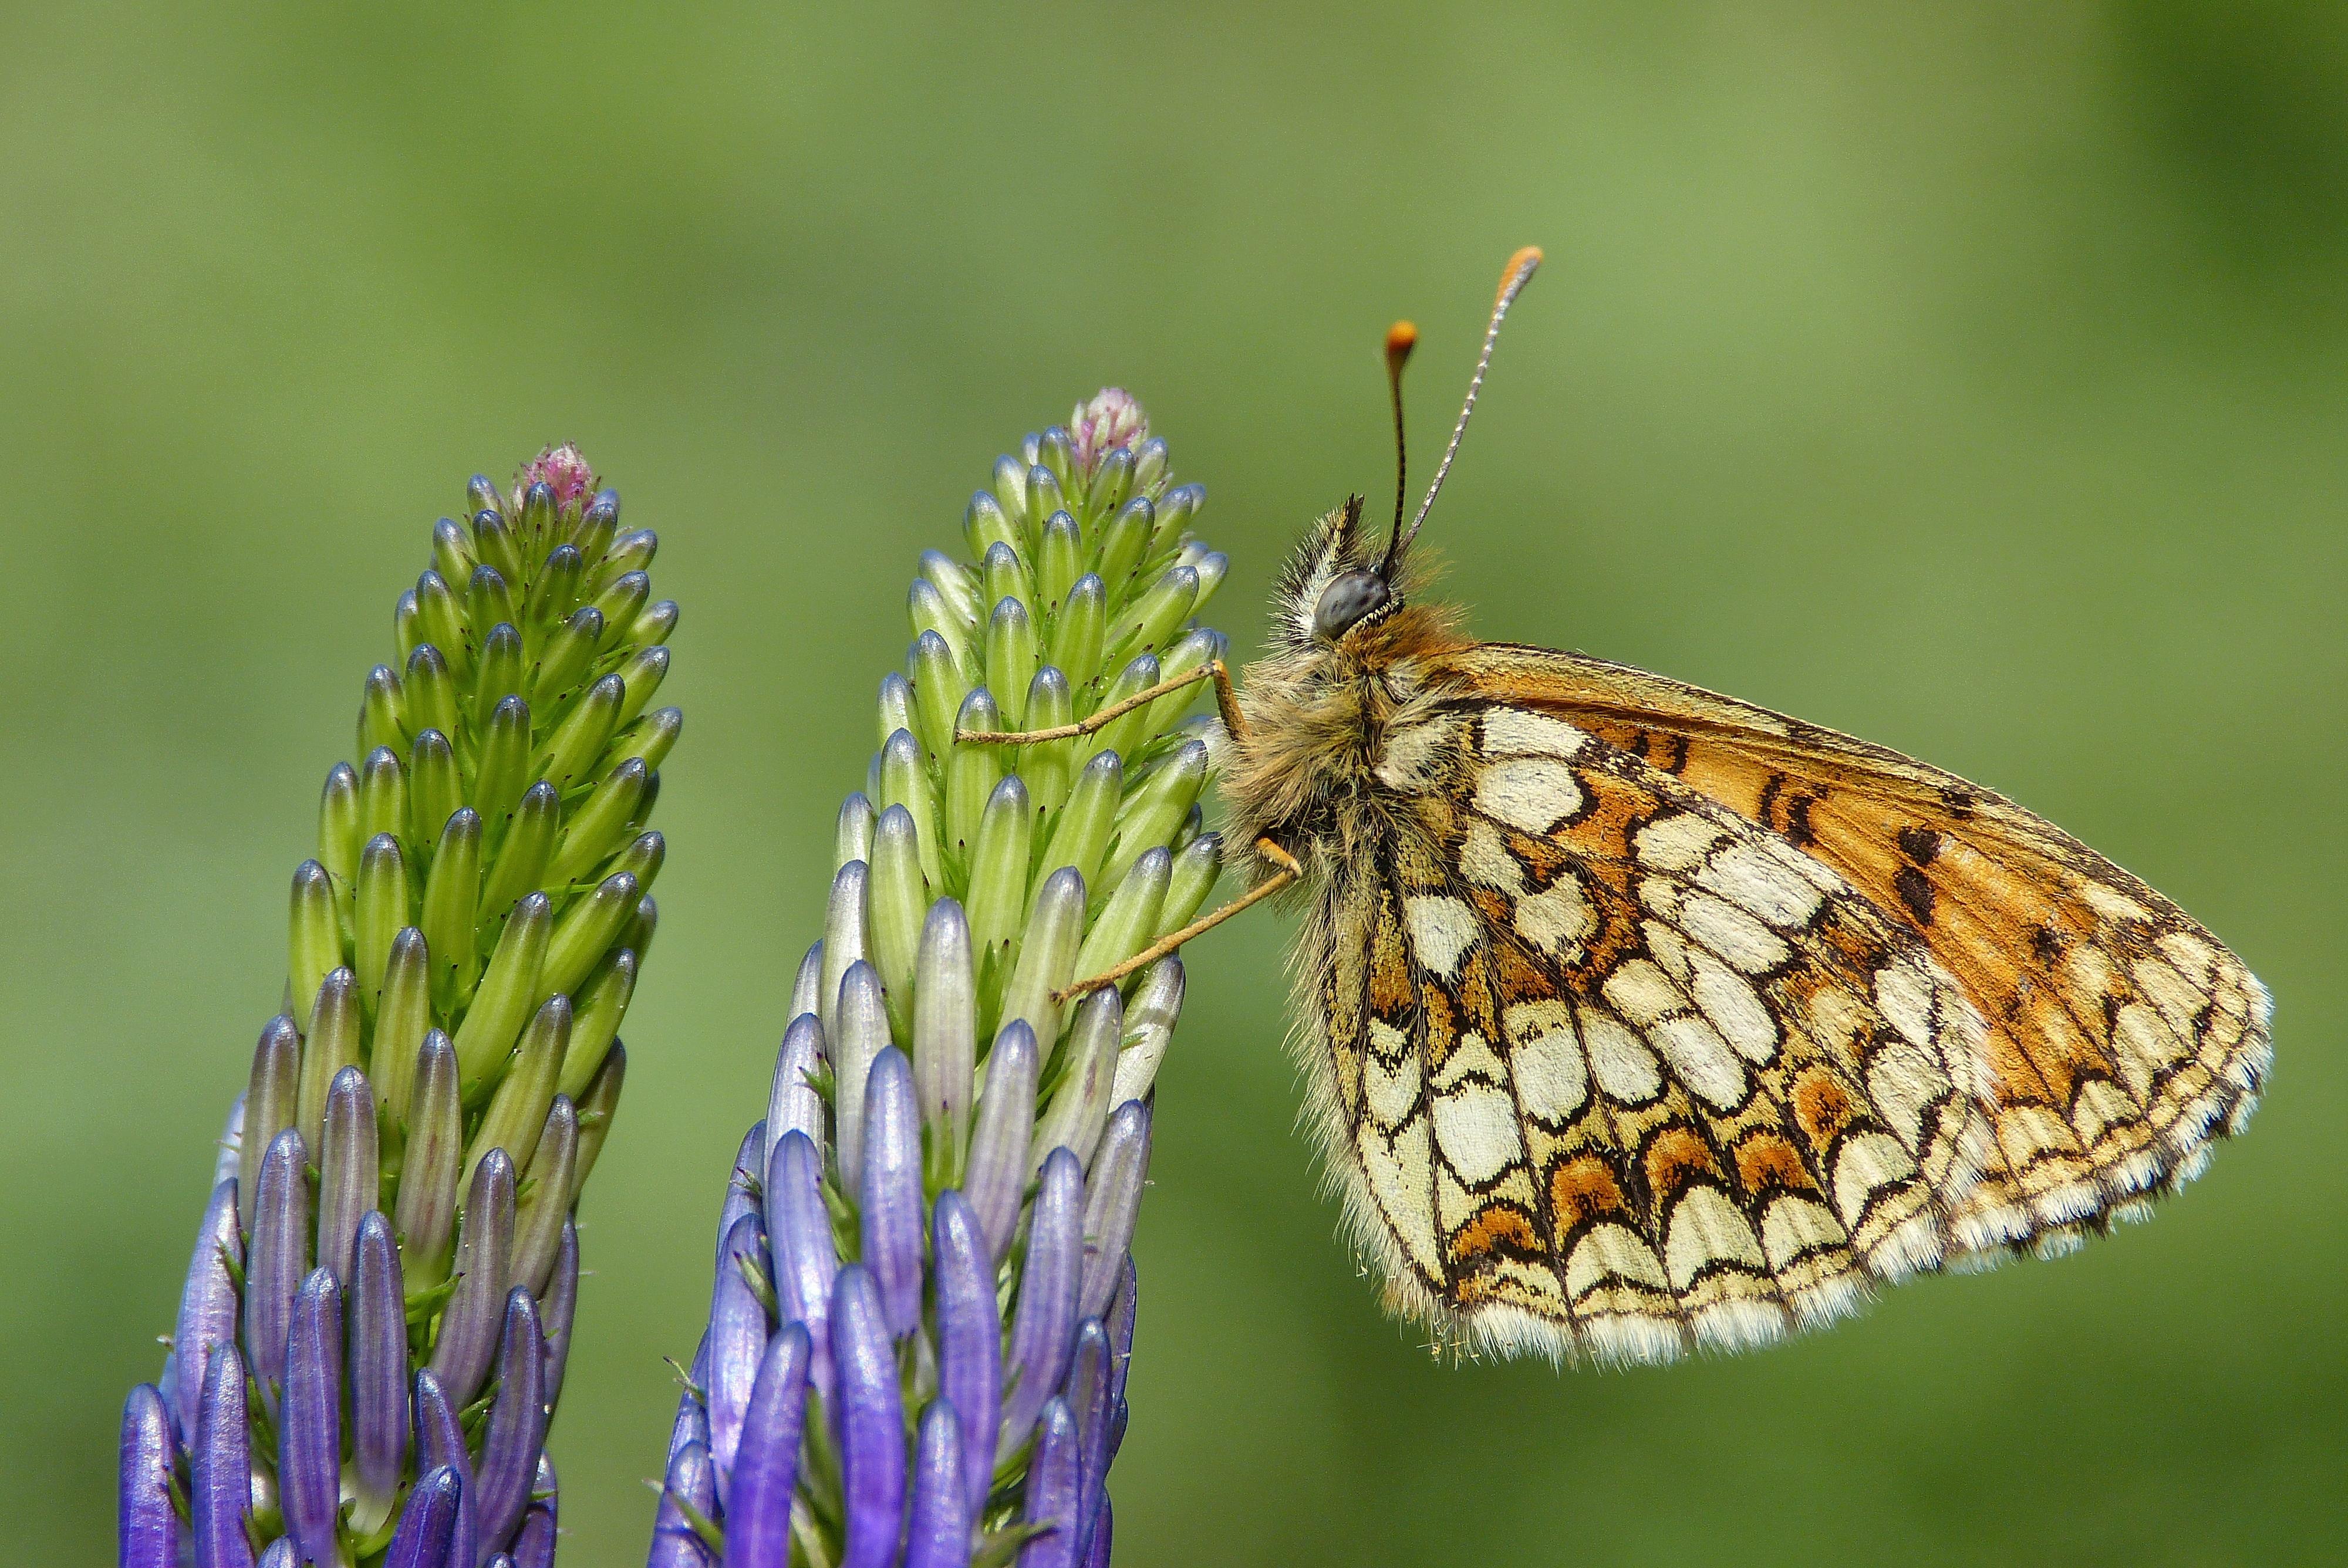 Mariposa en macro - 4000x2672